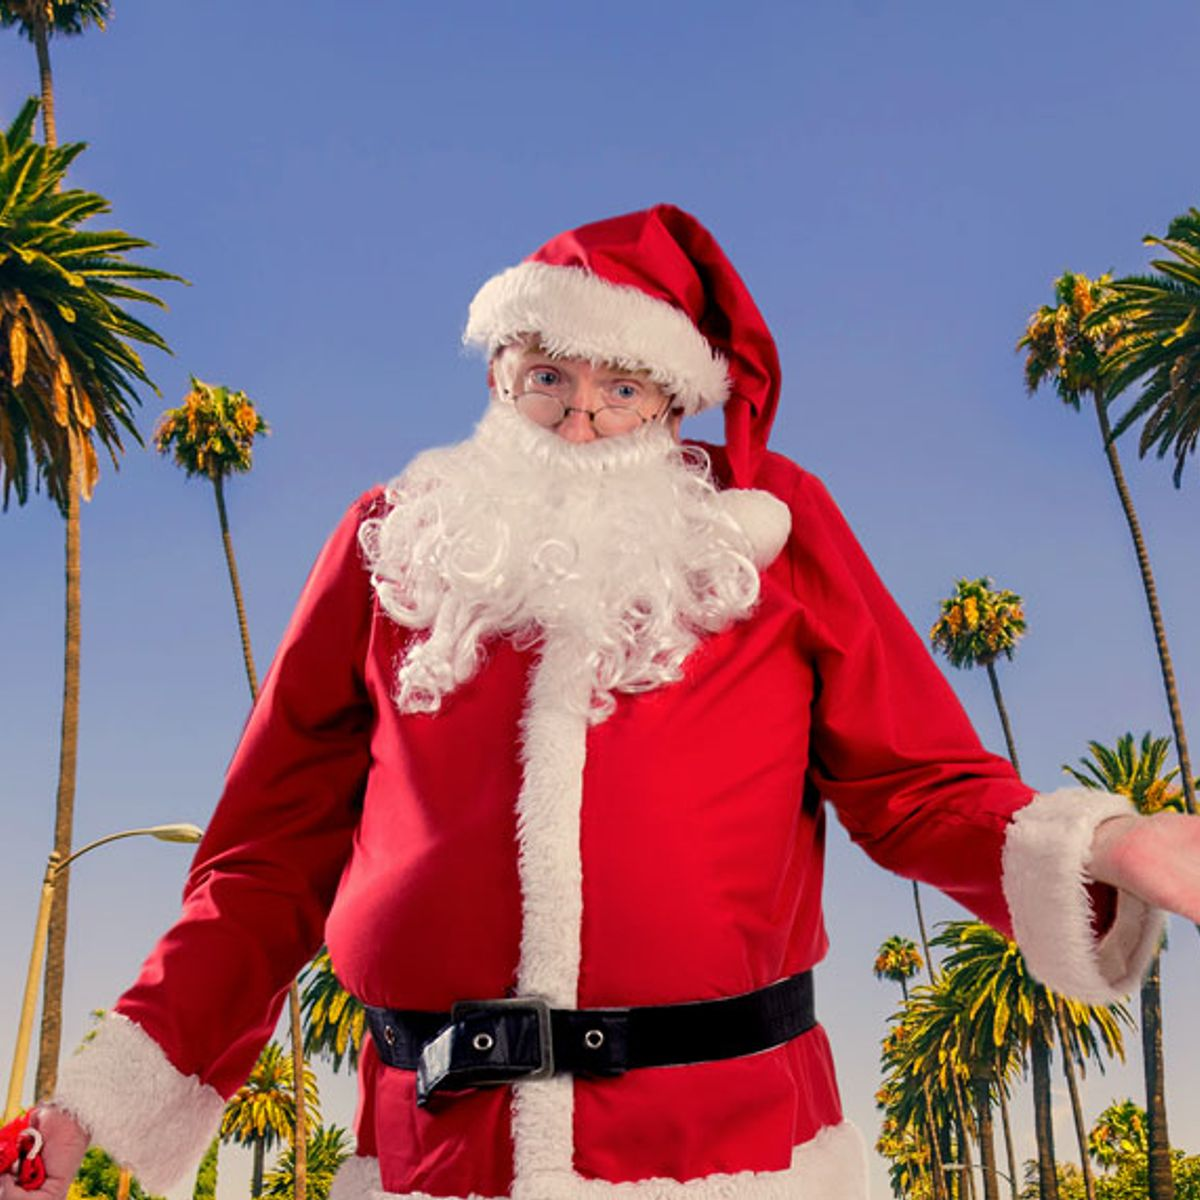 Frisky moms, Porsche-demanding kids: A Santa-for-hire's Christmas in Los Angeles